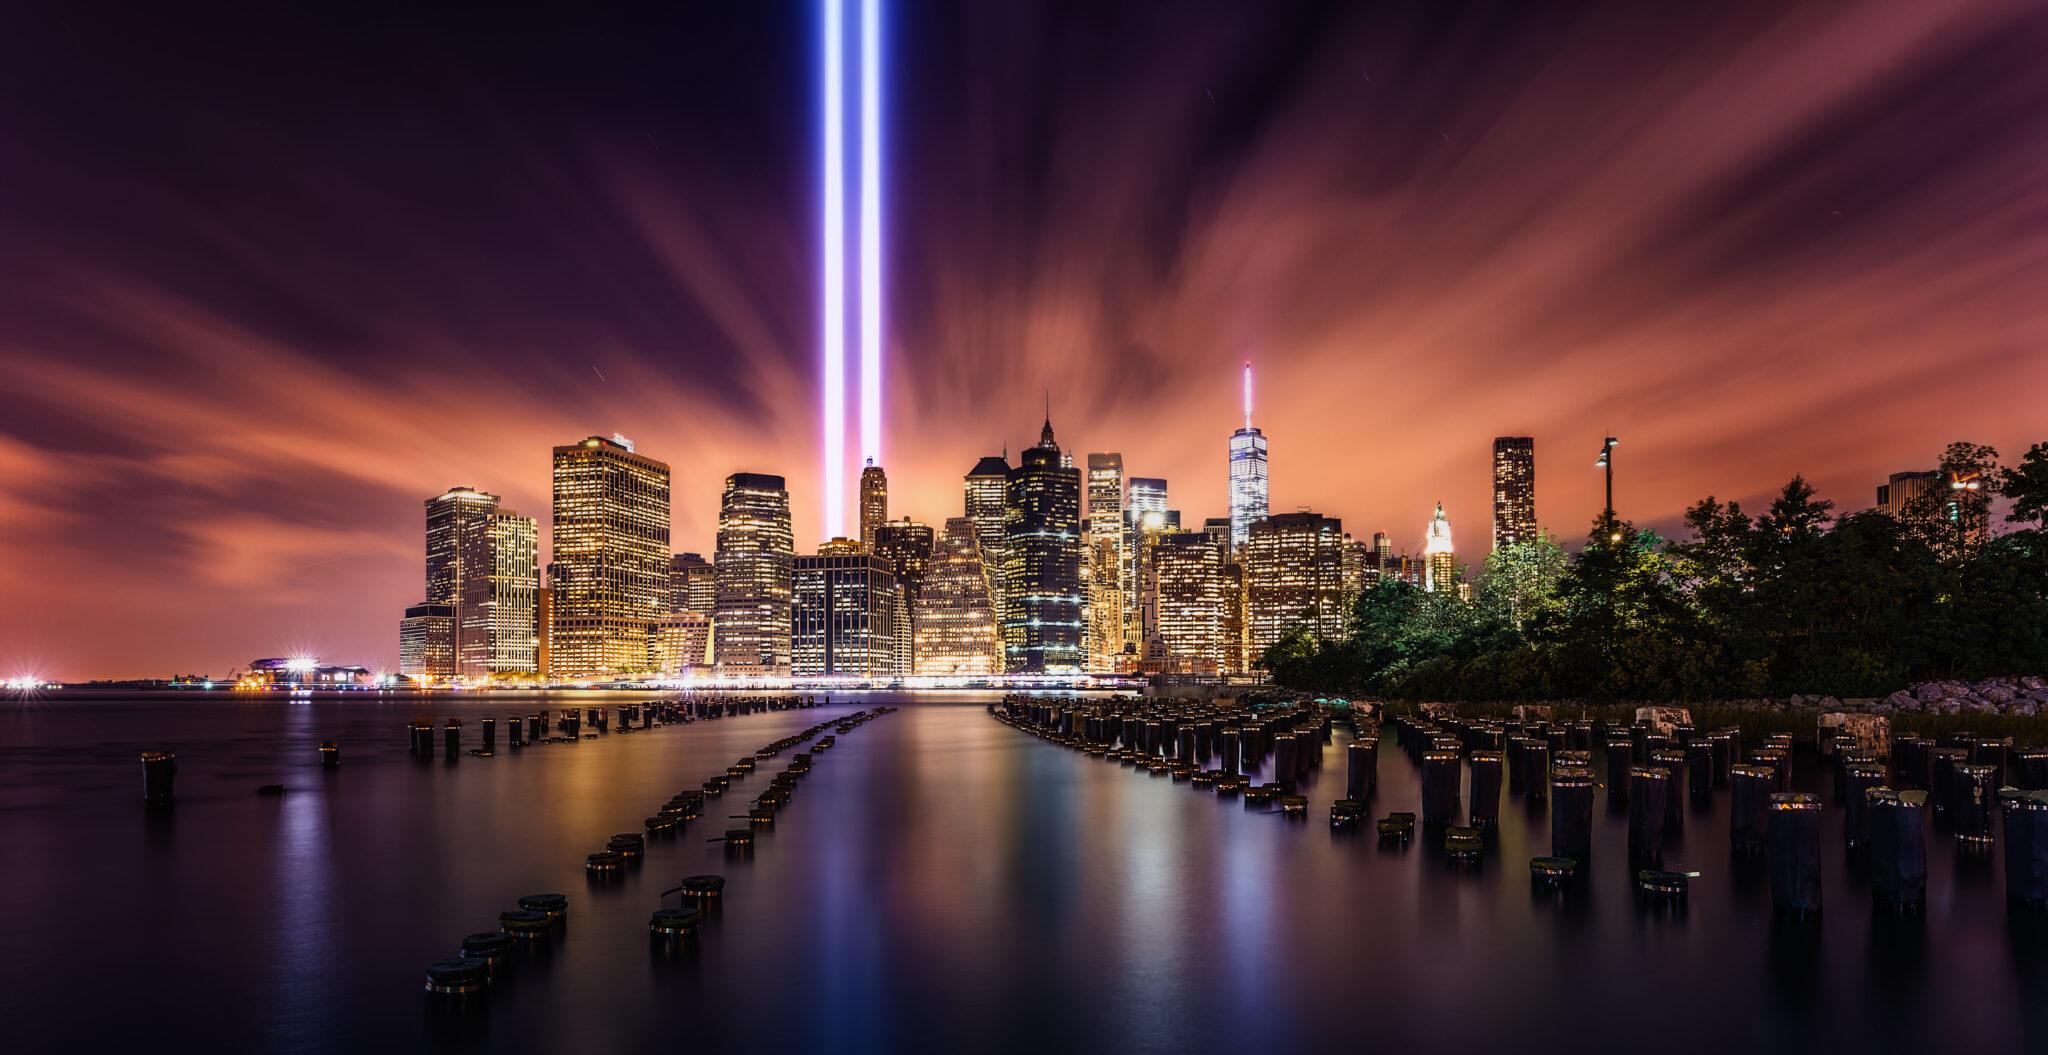 Photo of World Trade Center Memorial on 9/11 anniversary